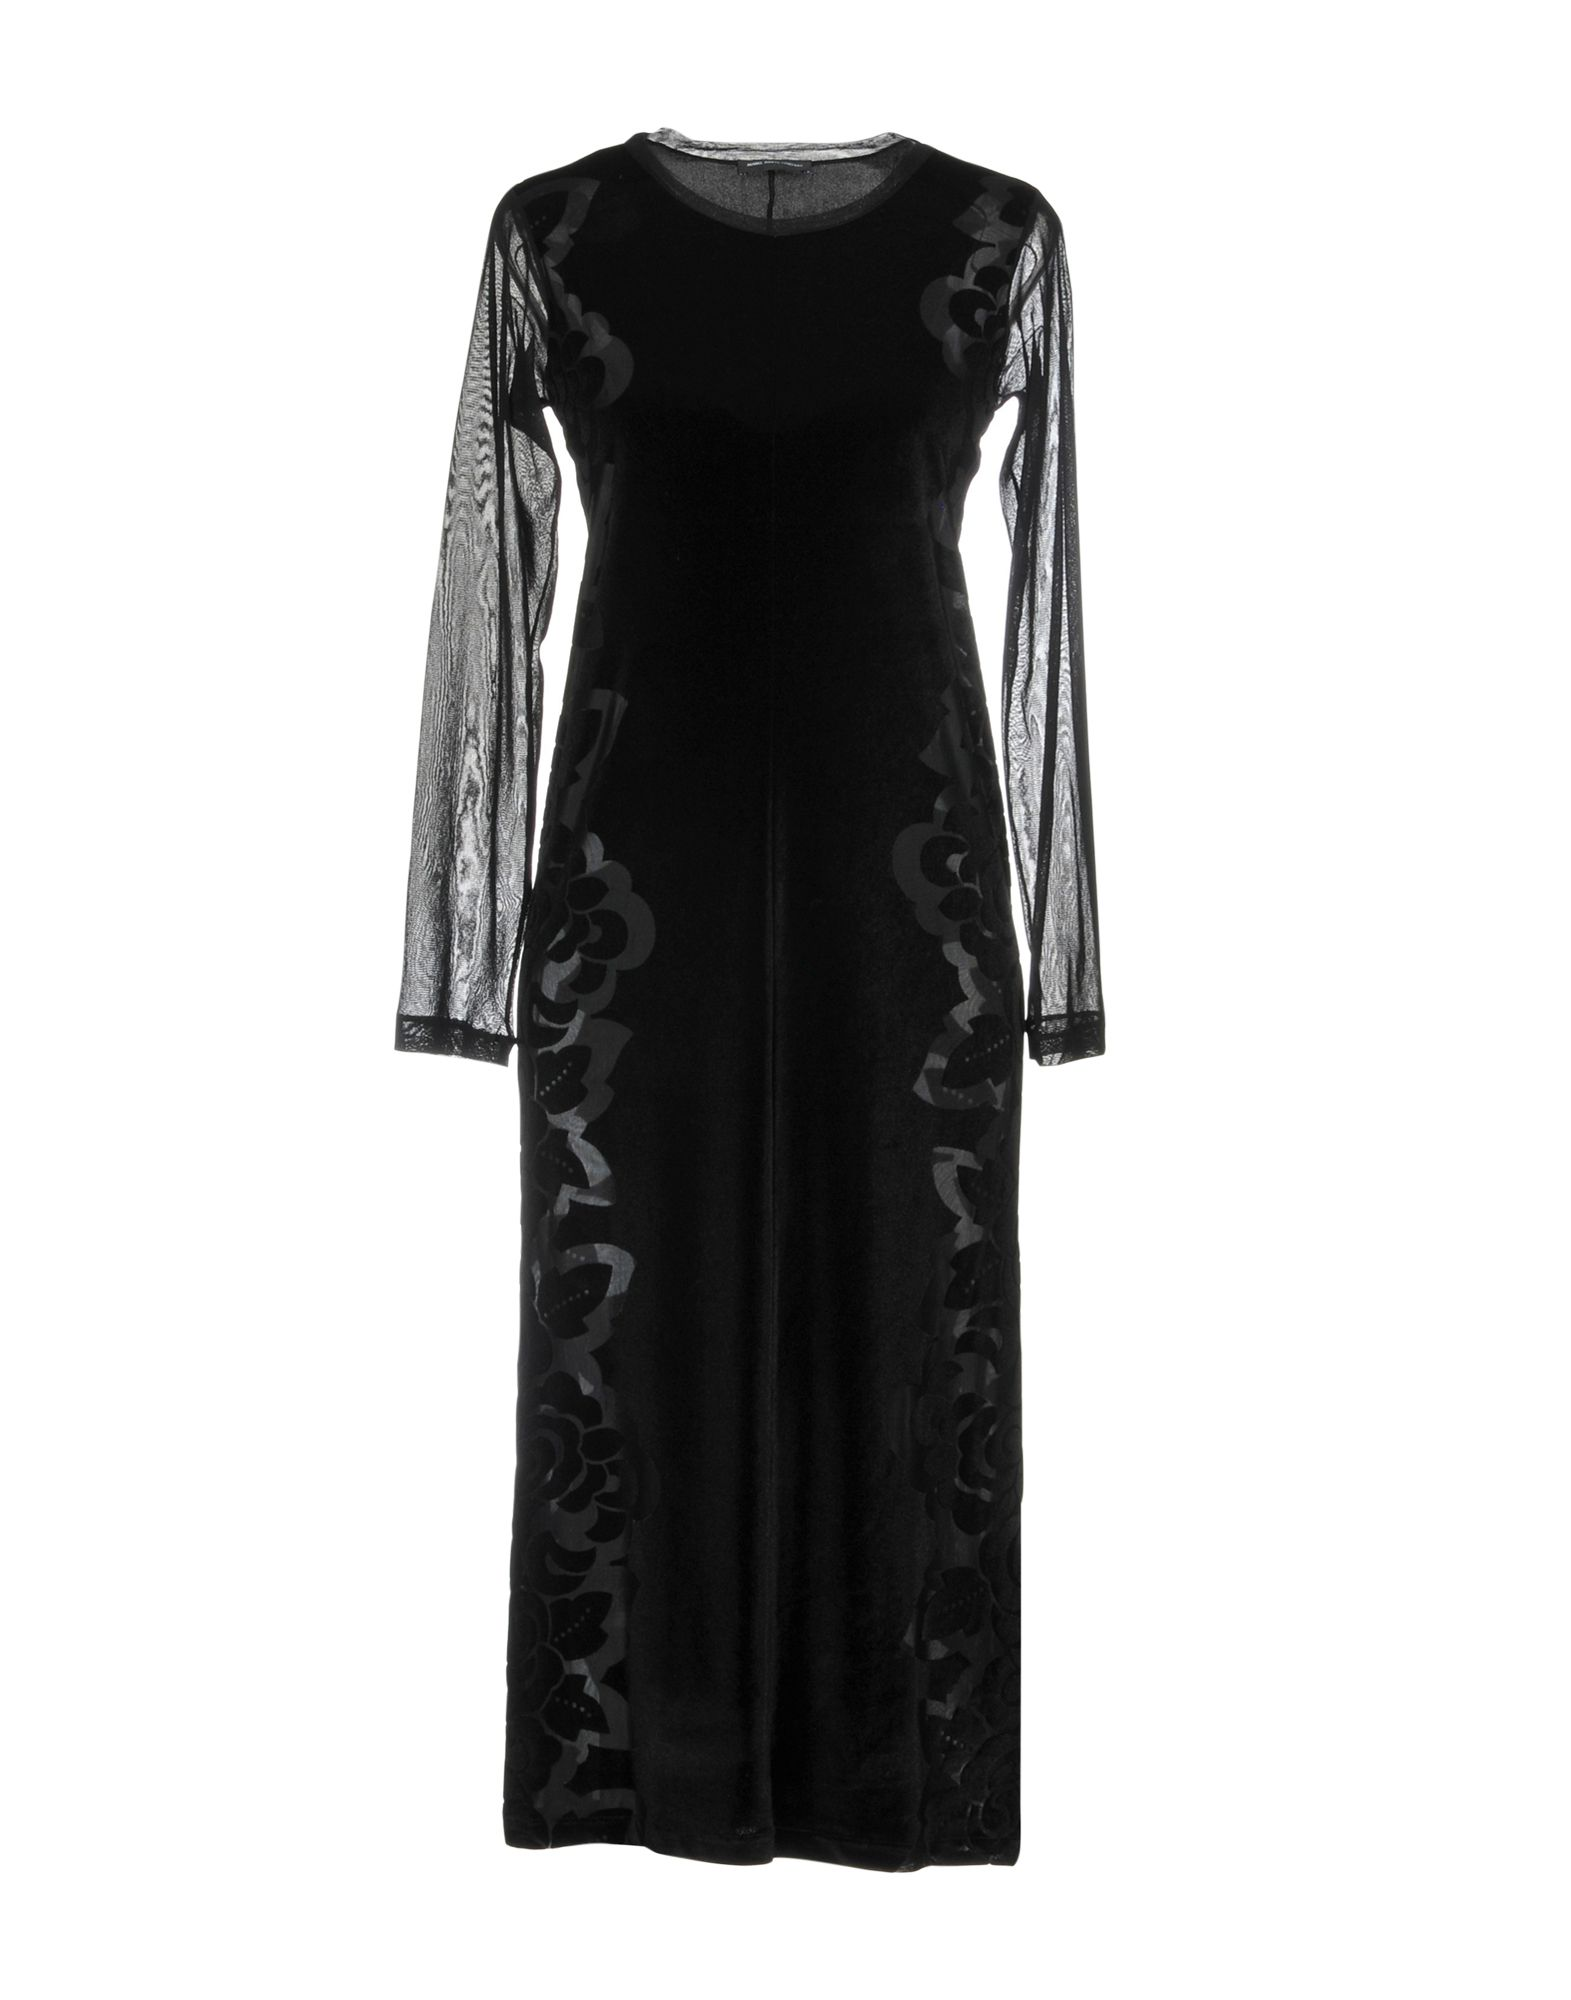 MNML COUTURE Платье длиной 3/4 moschino couture юбка длиной 3 4